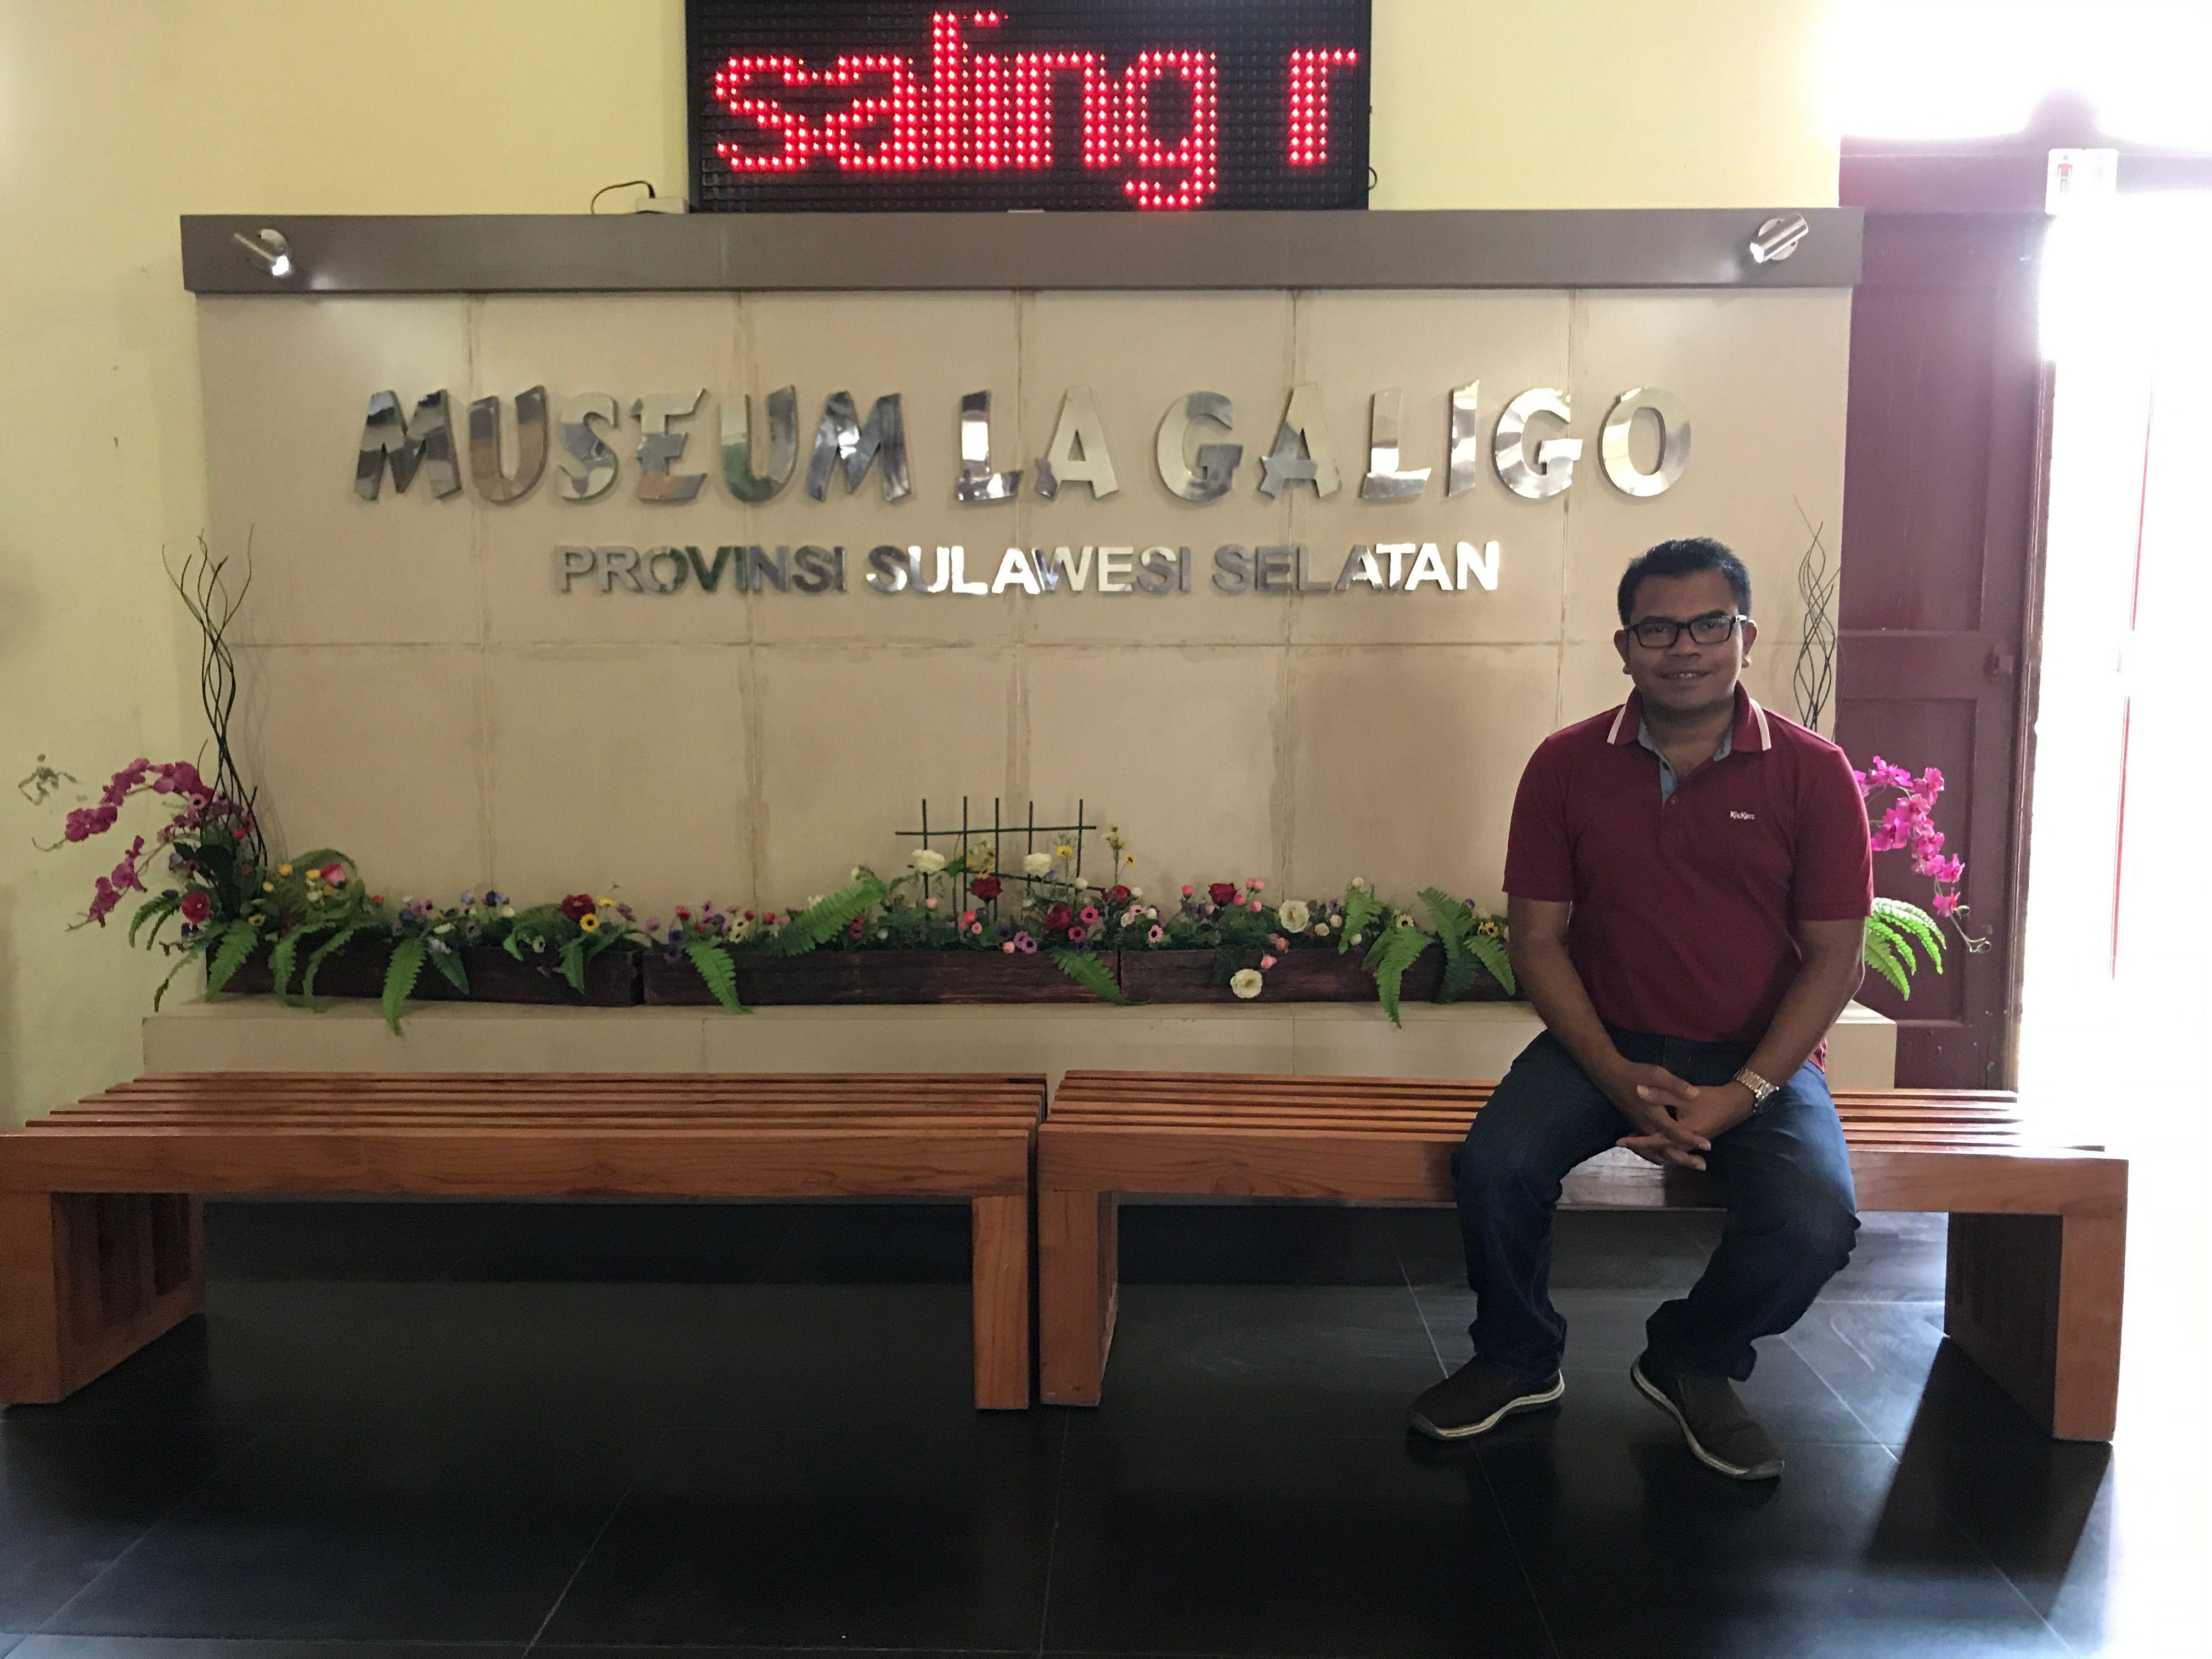 Pulotravels 17 Melihat Koleksi Museum La Galigo Makassar Steemit Beranjak